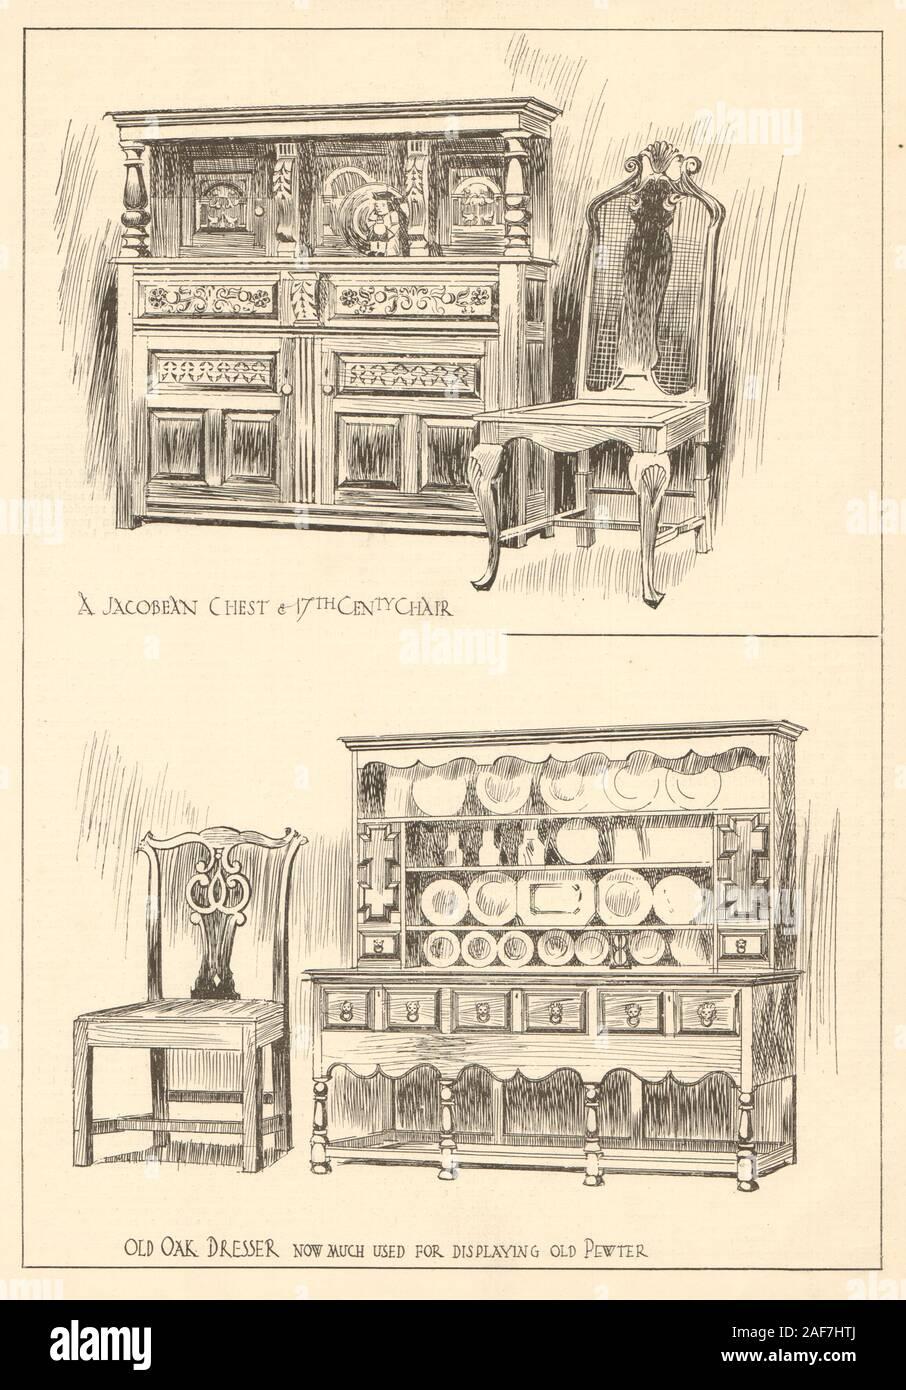 A Jacobean chest & 17th cent chair, old oak dresser 1907 antique print Stock Photo